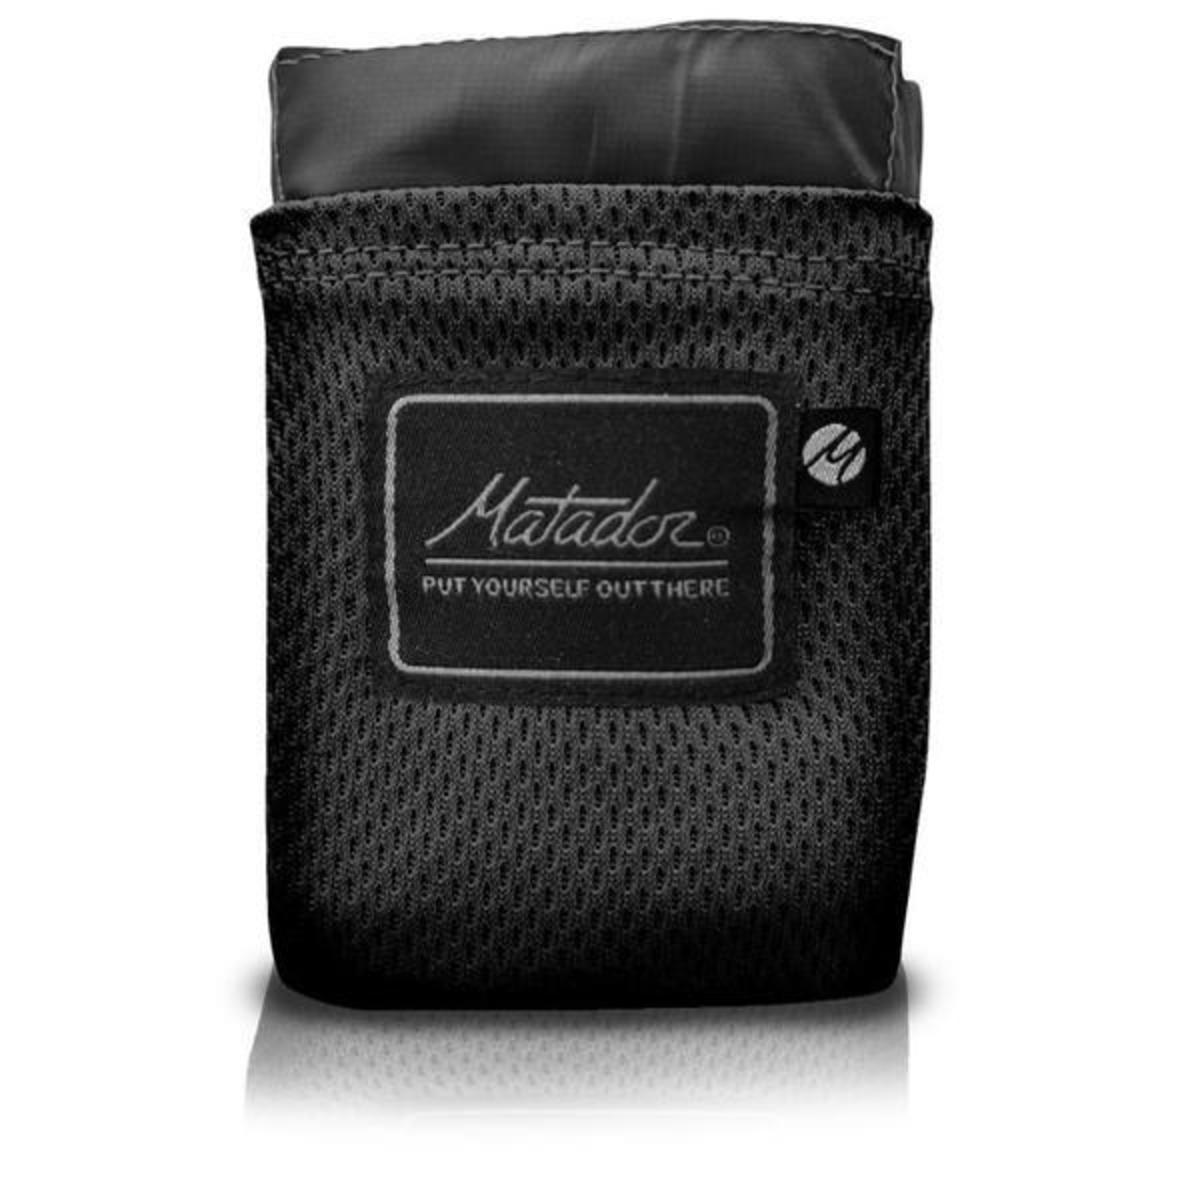 Pocket Blanket™ 2.0 口袋野餐戶外多功能墊 - 黑色